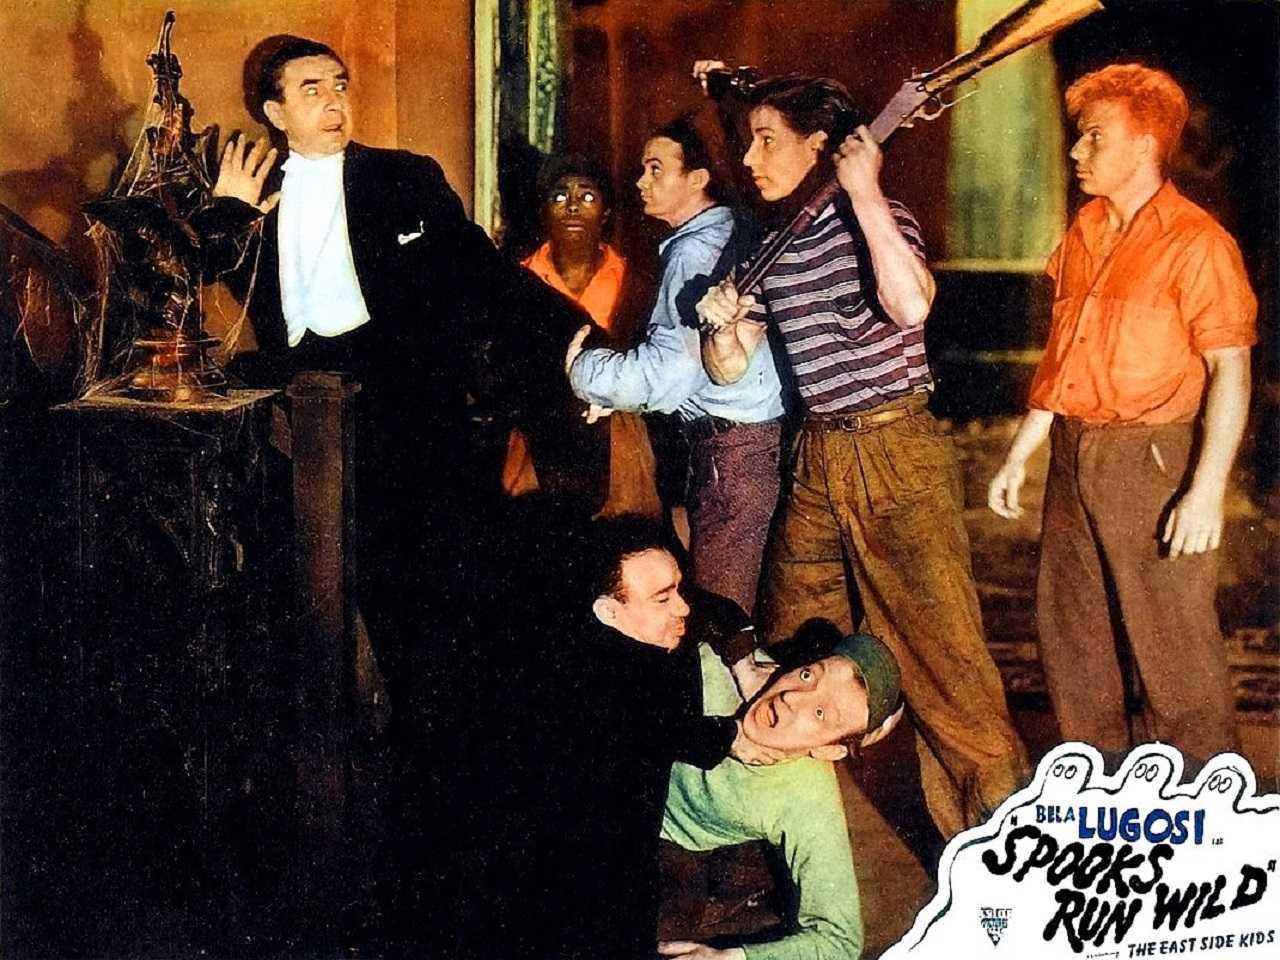 Bela Lugosi, Sunshine Sammy Morrison, Leo Gorcey, Bobby Jordan, Donald Haines, Angelo Rossitto and Huntz Hall in Spooks Run Wild (1941)